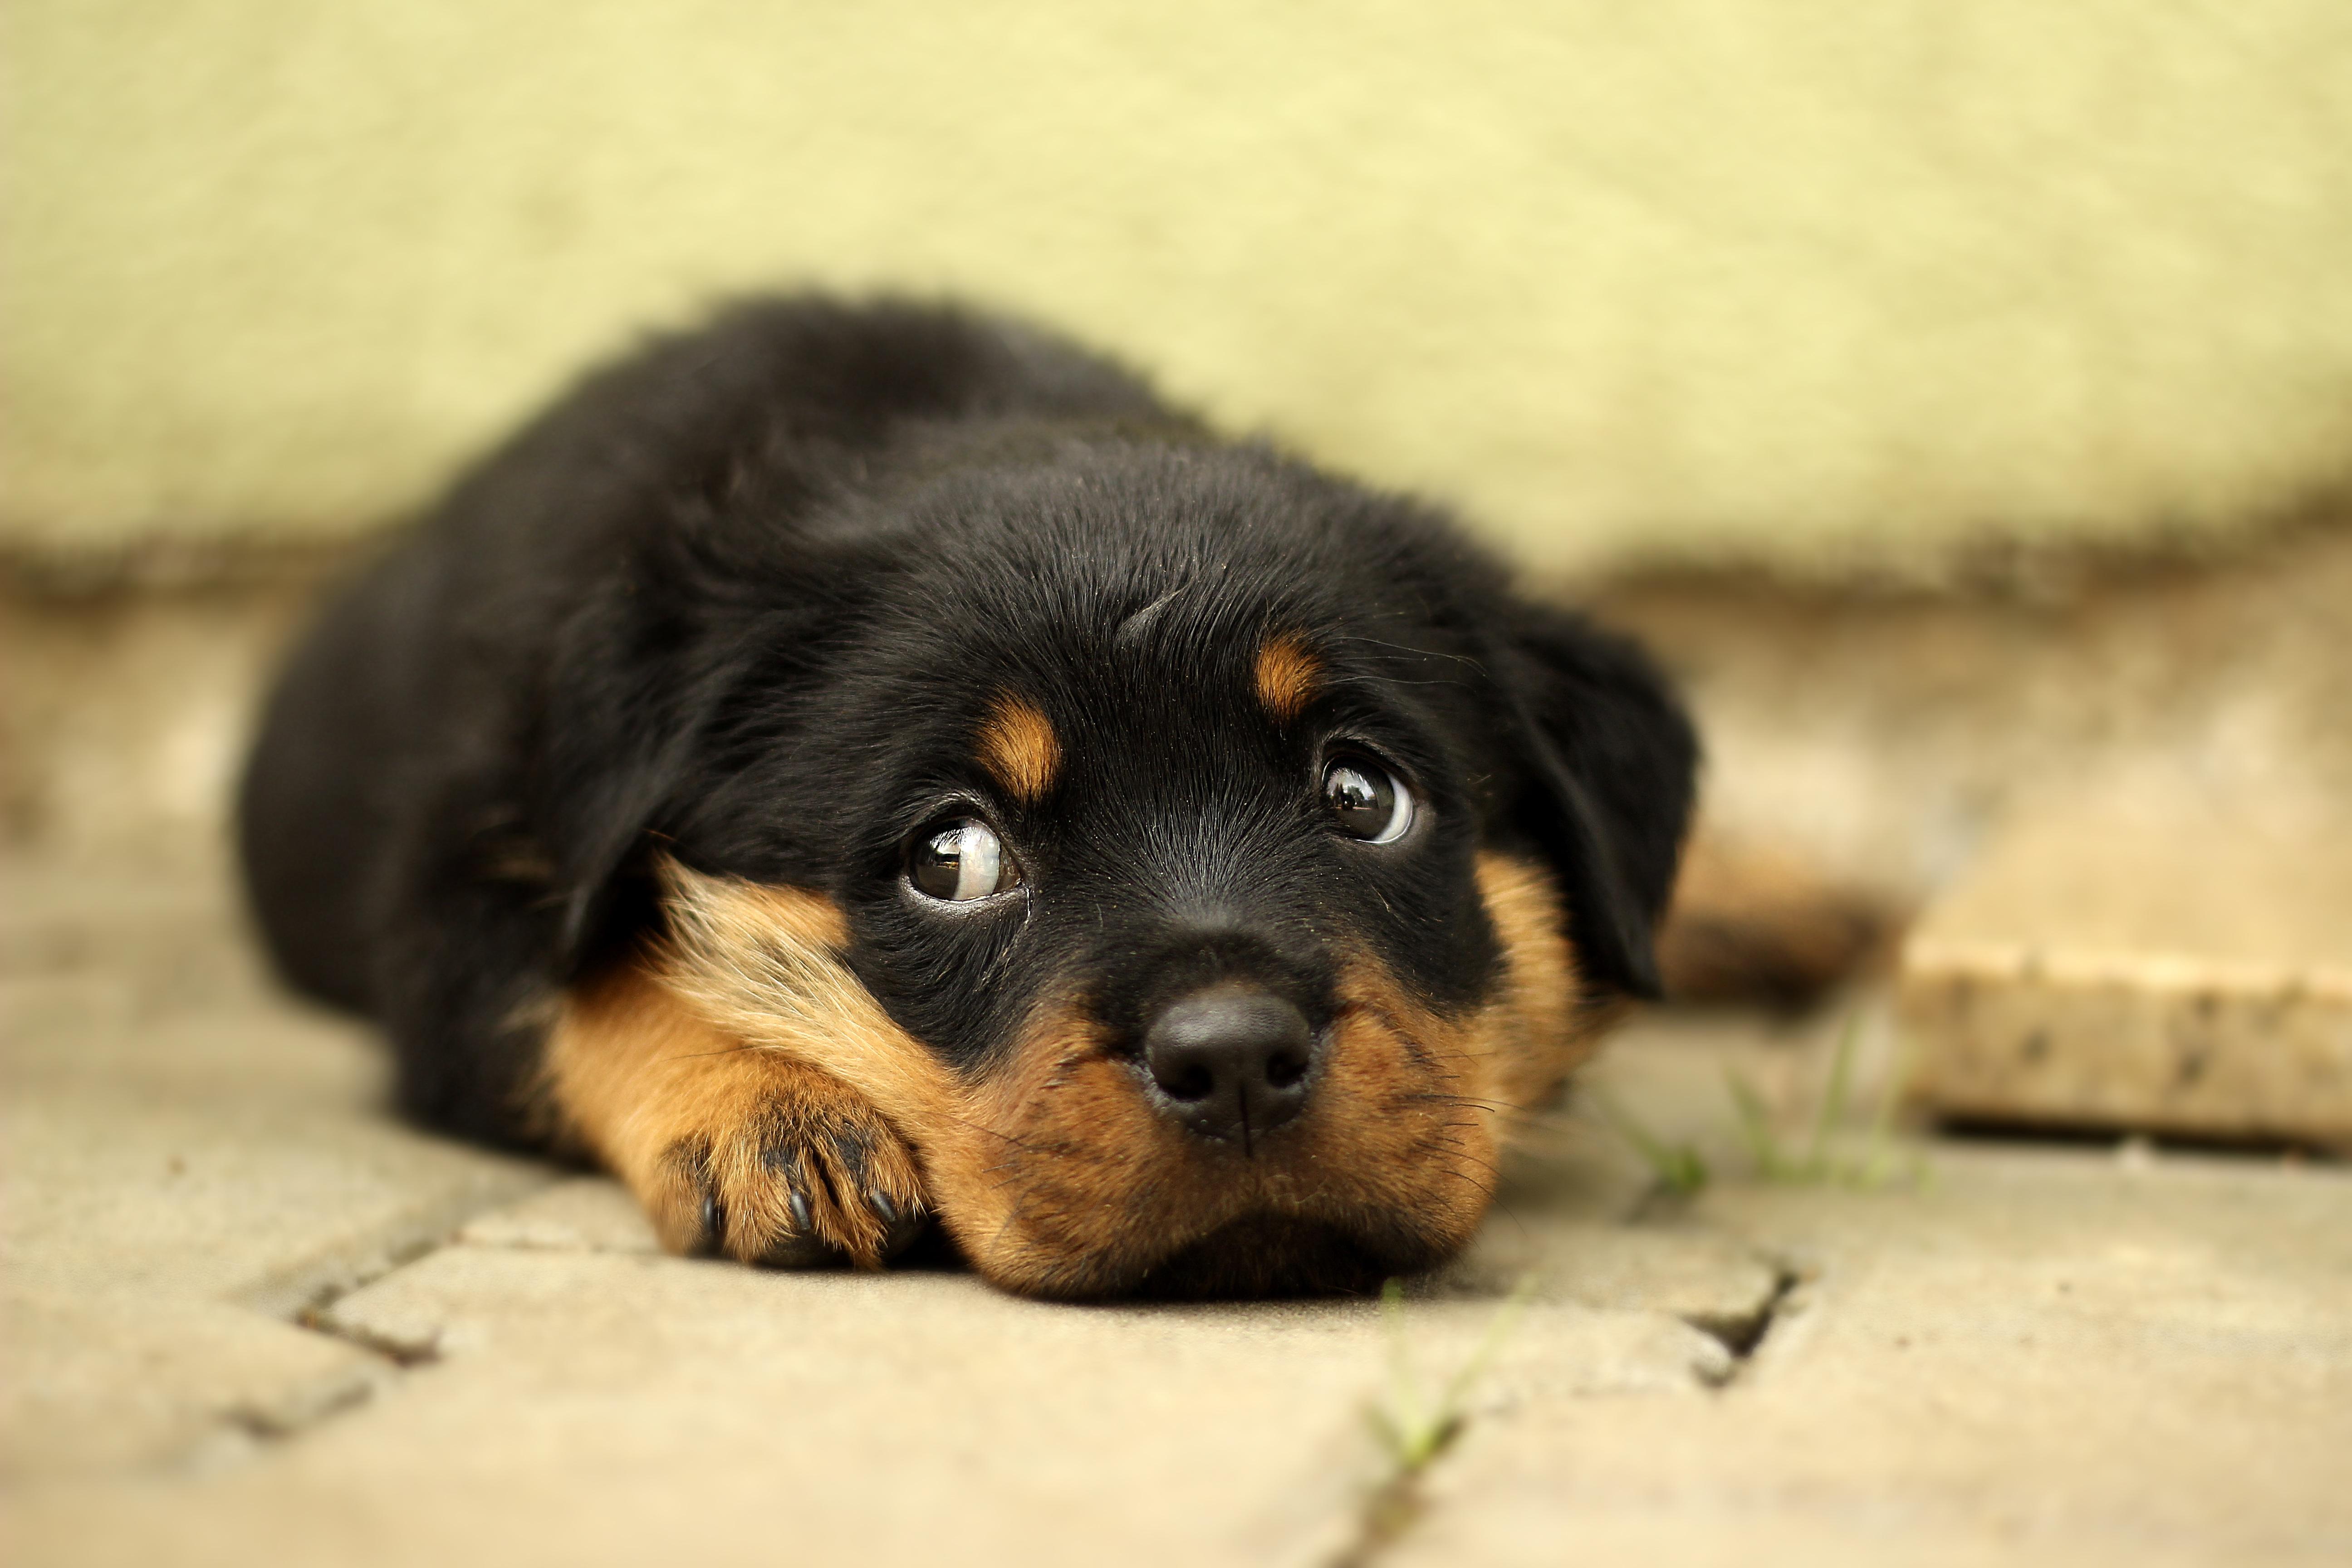 Lying Cute Rottweiler Puppy Dog Free Image